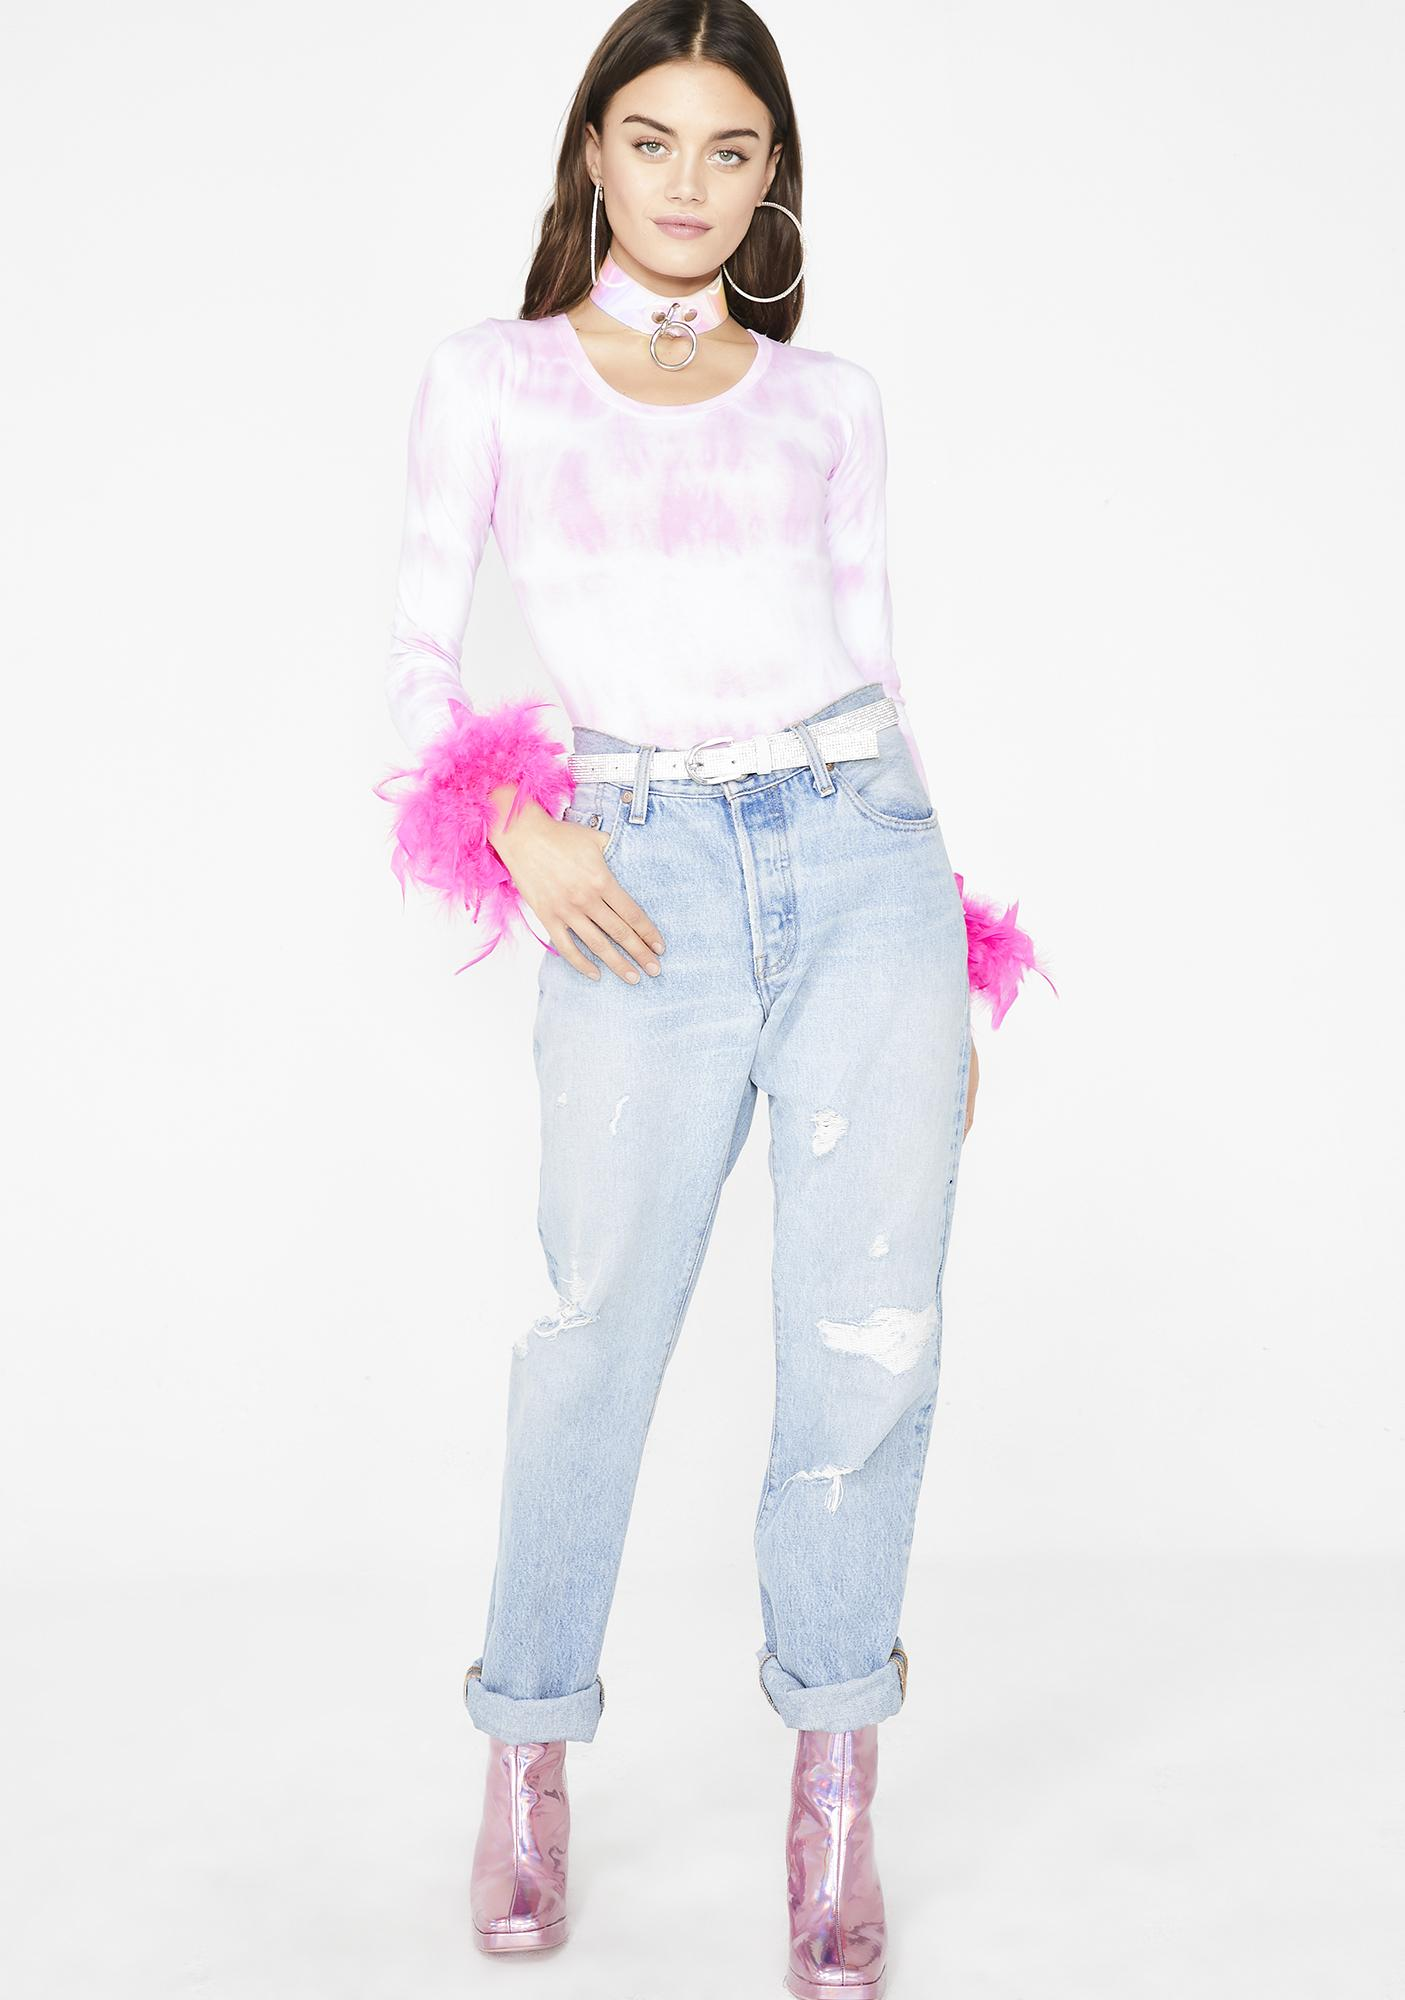 Daisy Shock Sweet Electric Mermaid Bodysuit